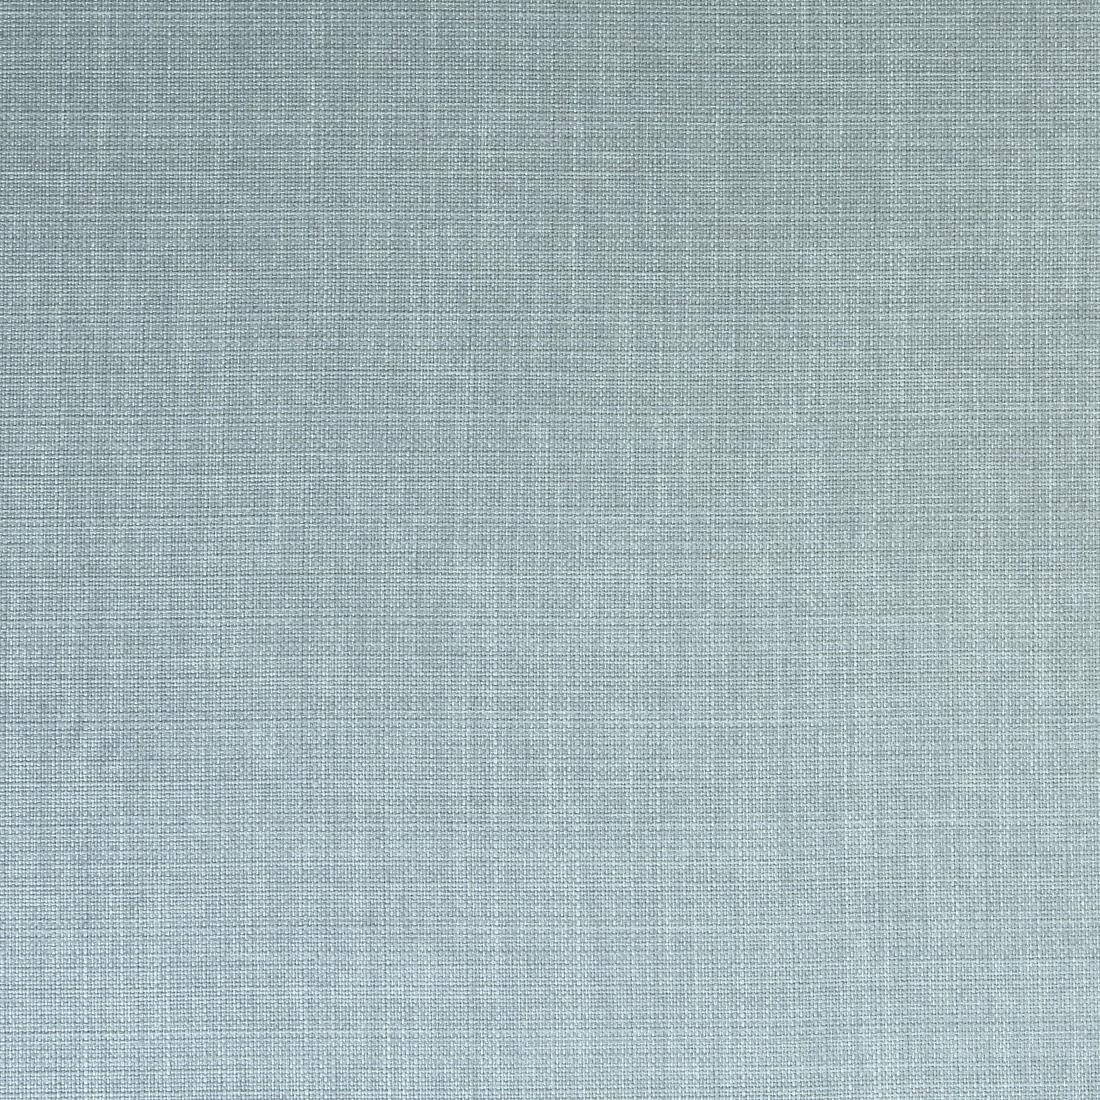 Linoso Dove Upholstery Fabric